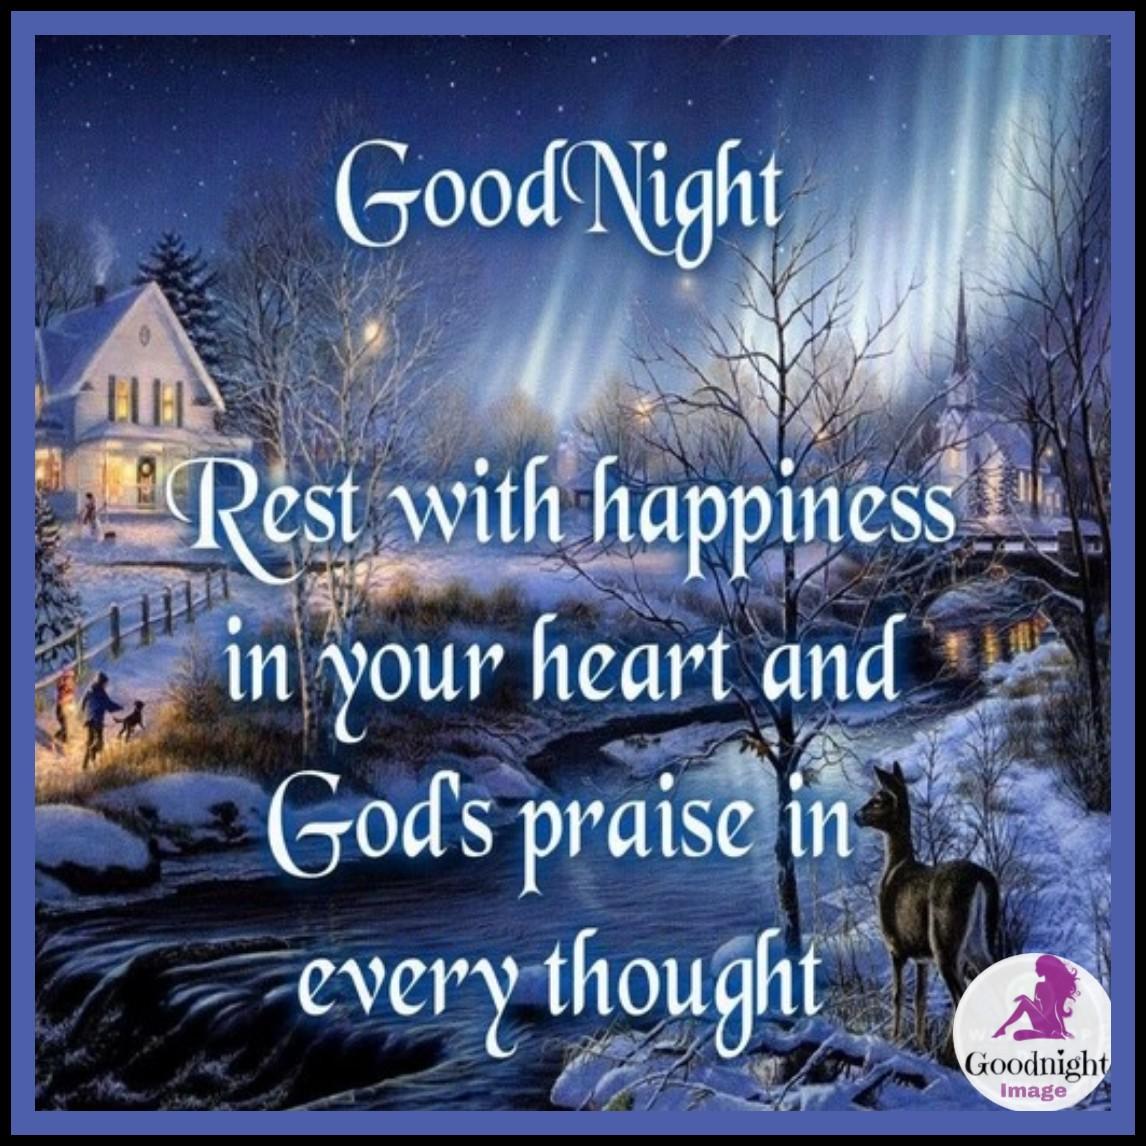 Good Night%2BImage 13